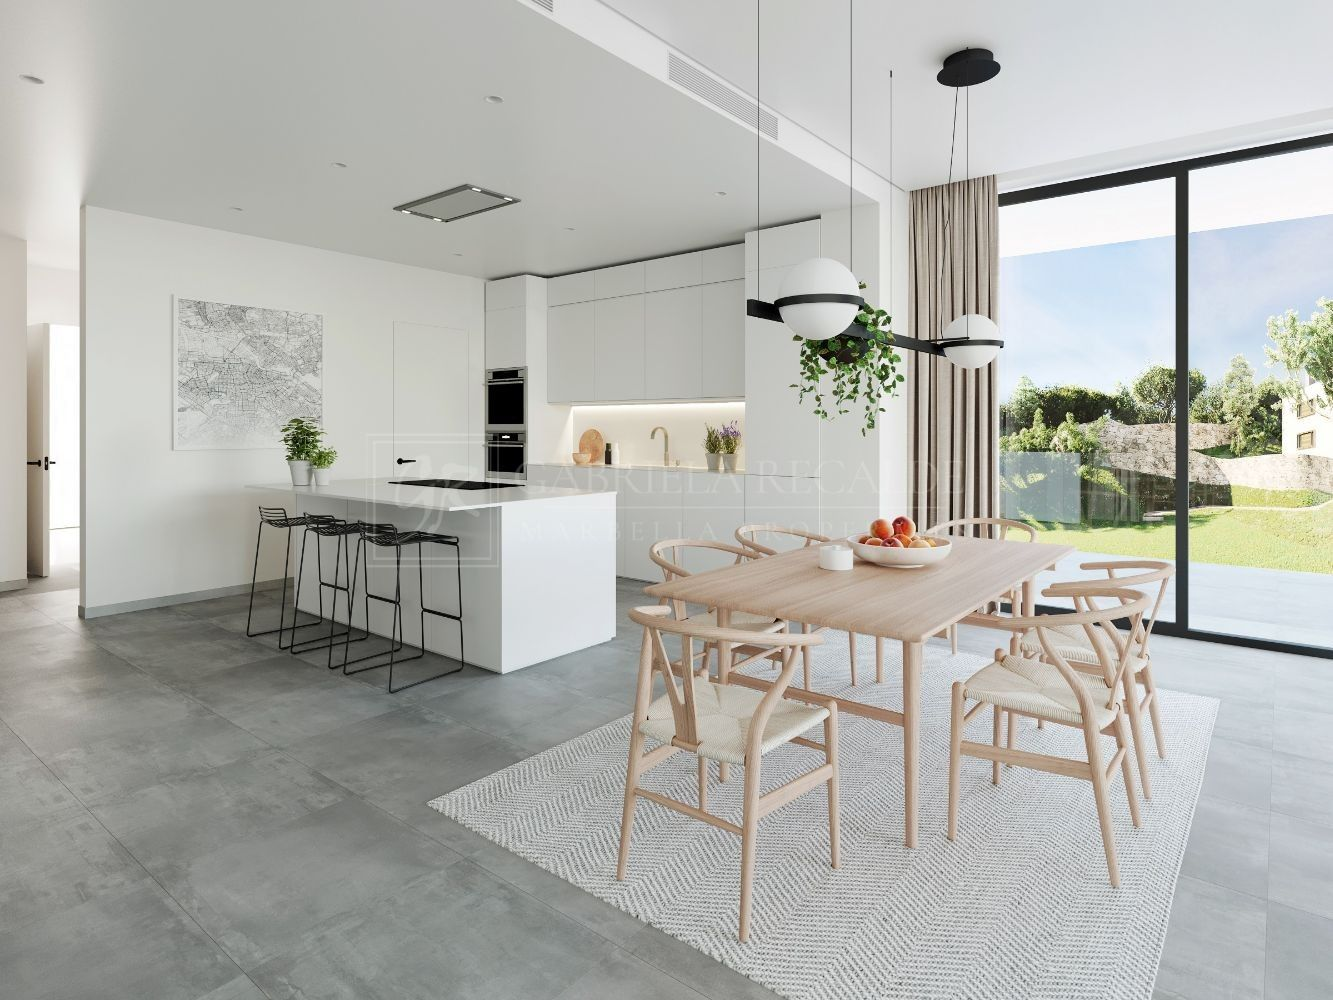 Ground Floor Apartment for sale in Artola, Marbella